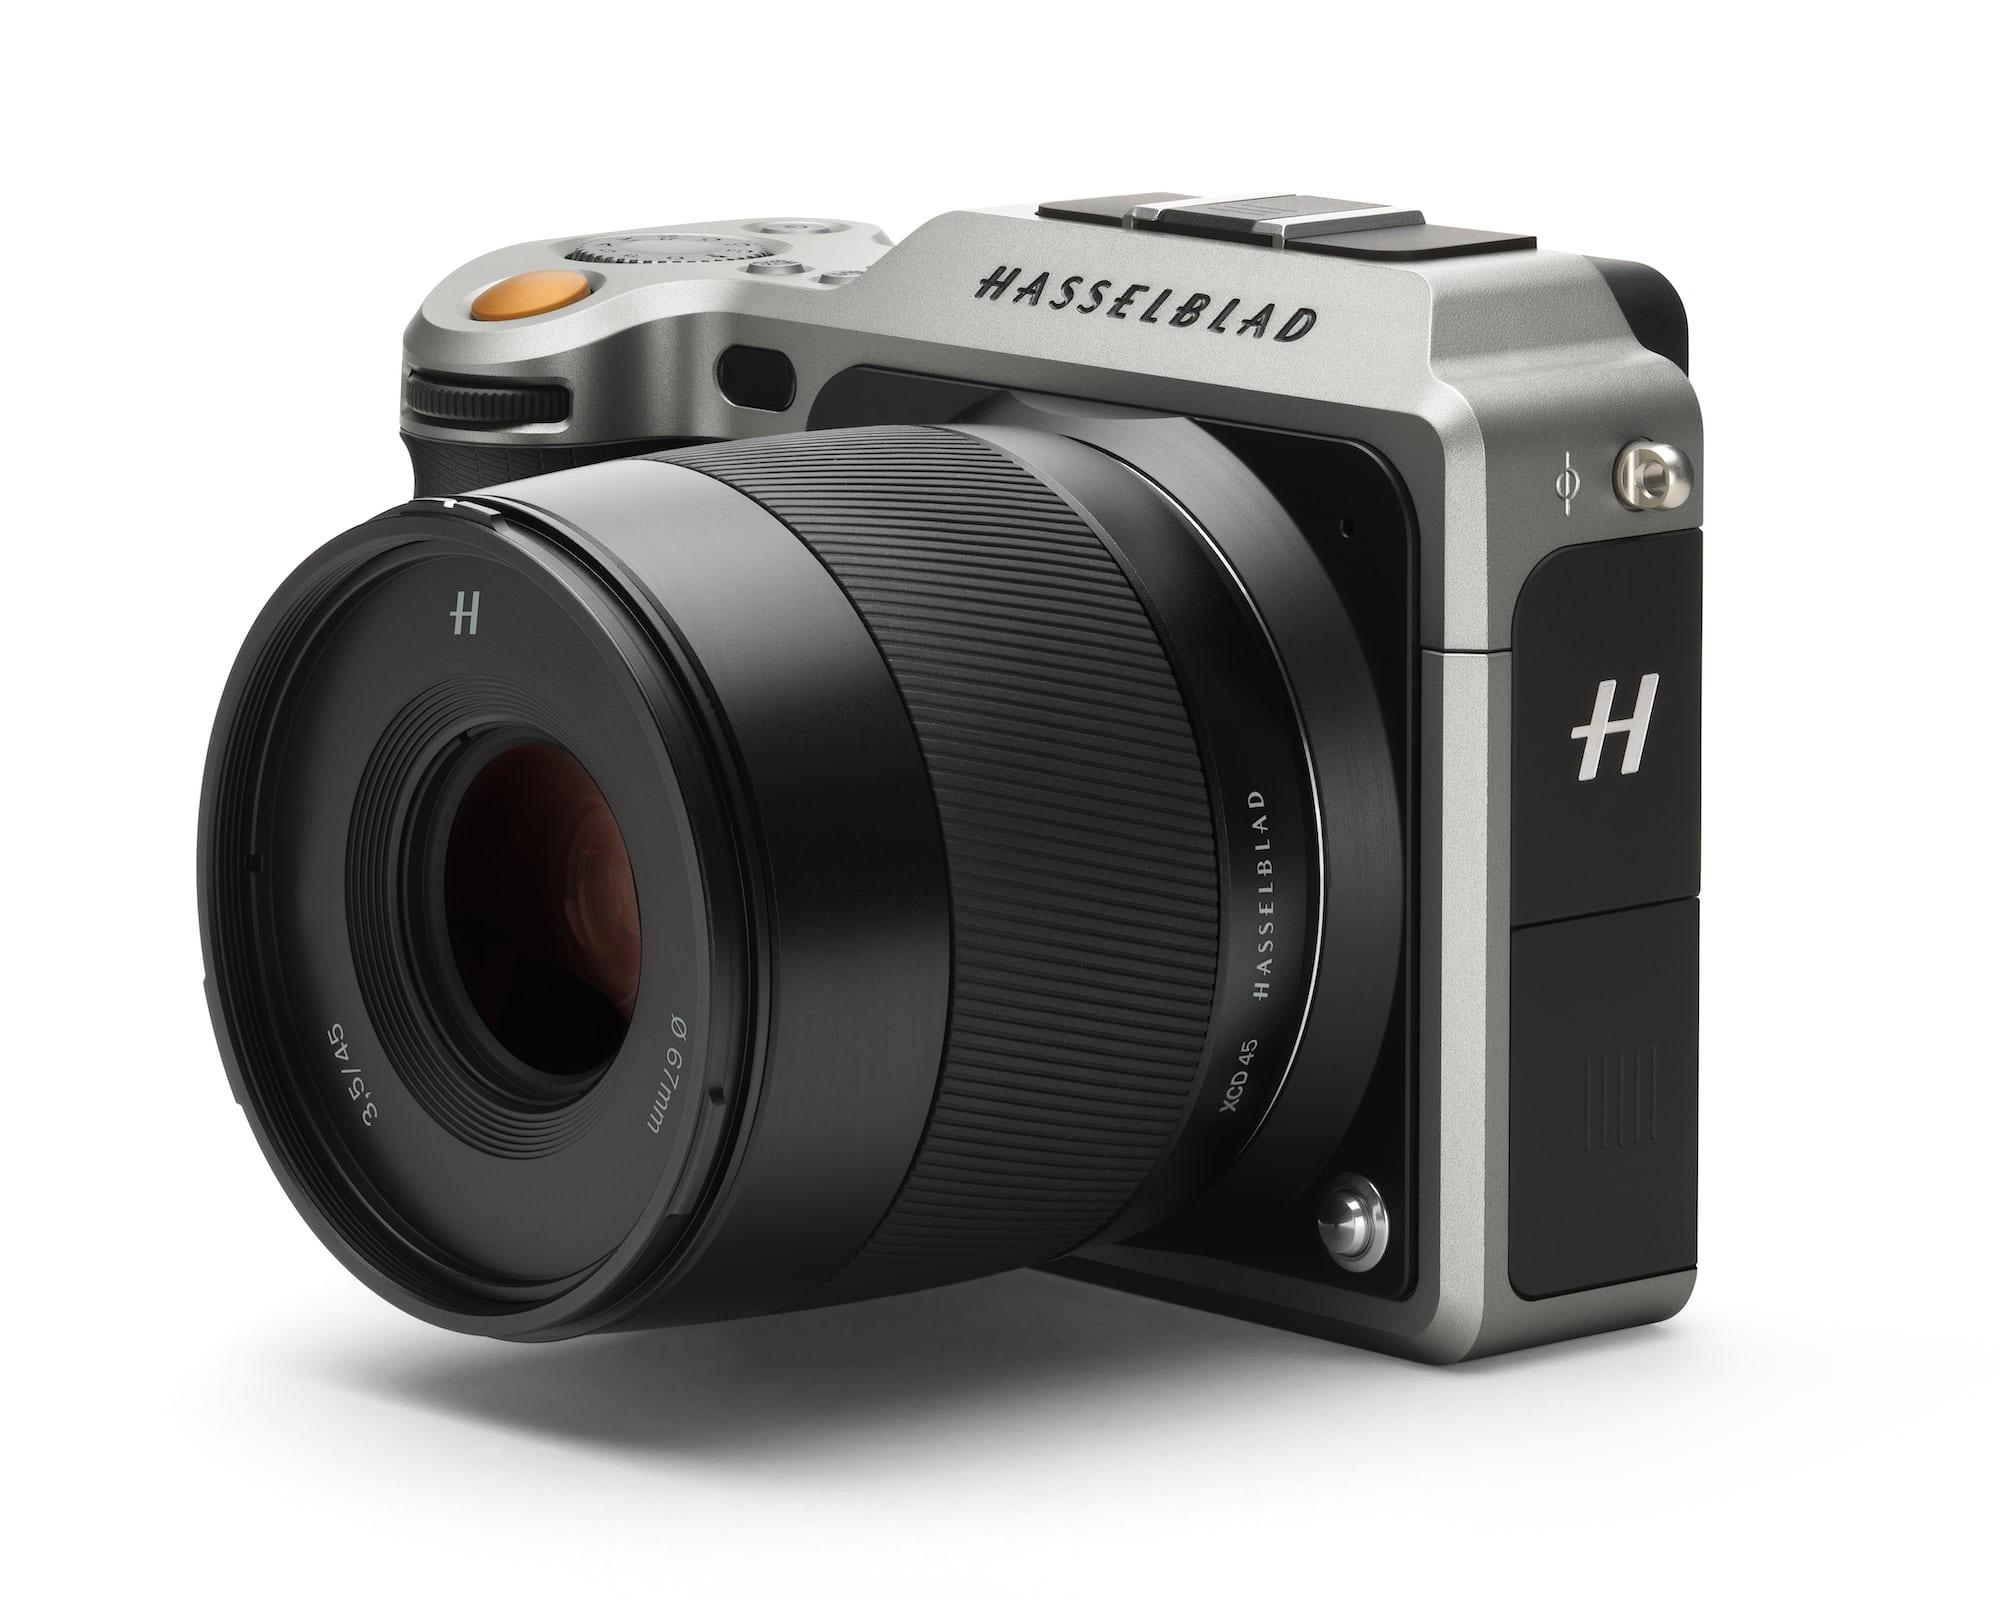 The Hasselblad X1D-50c